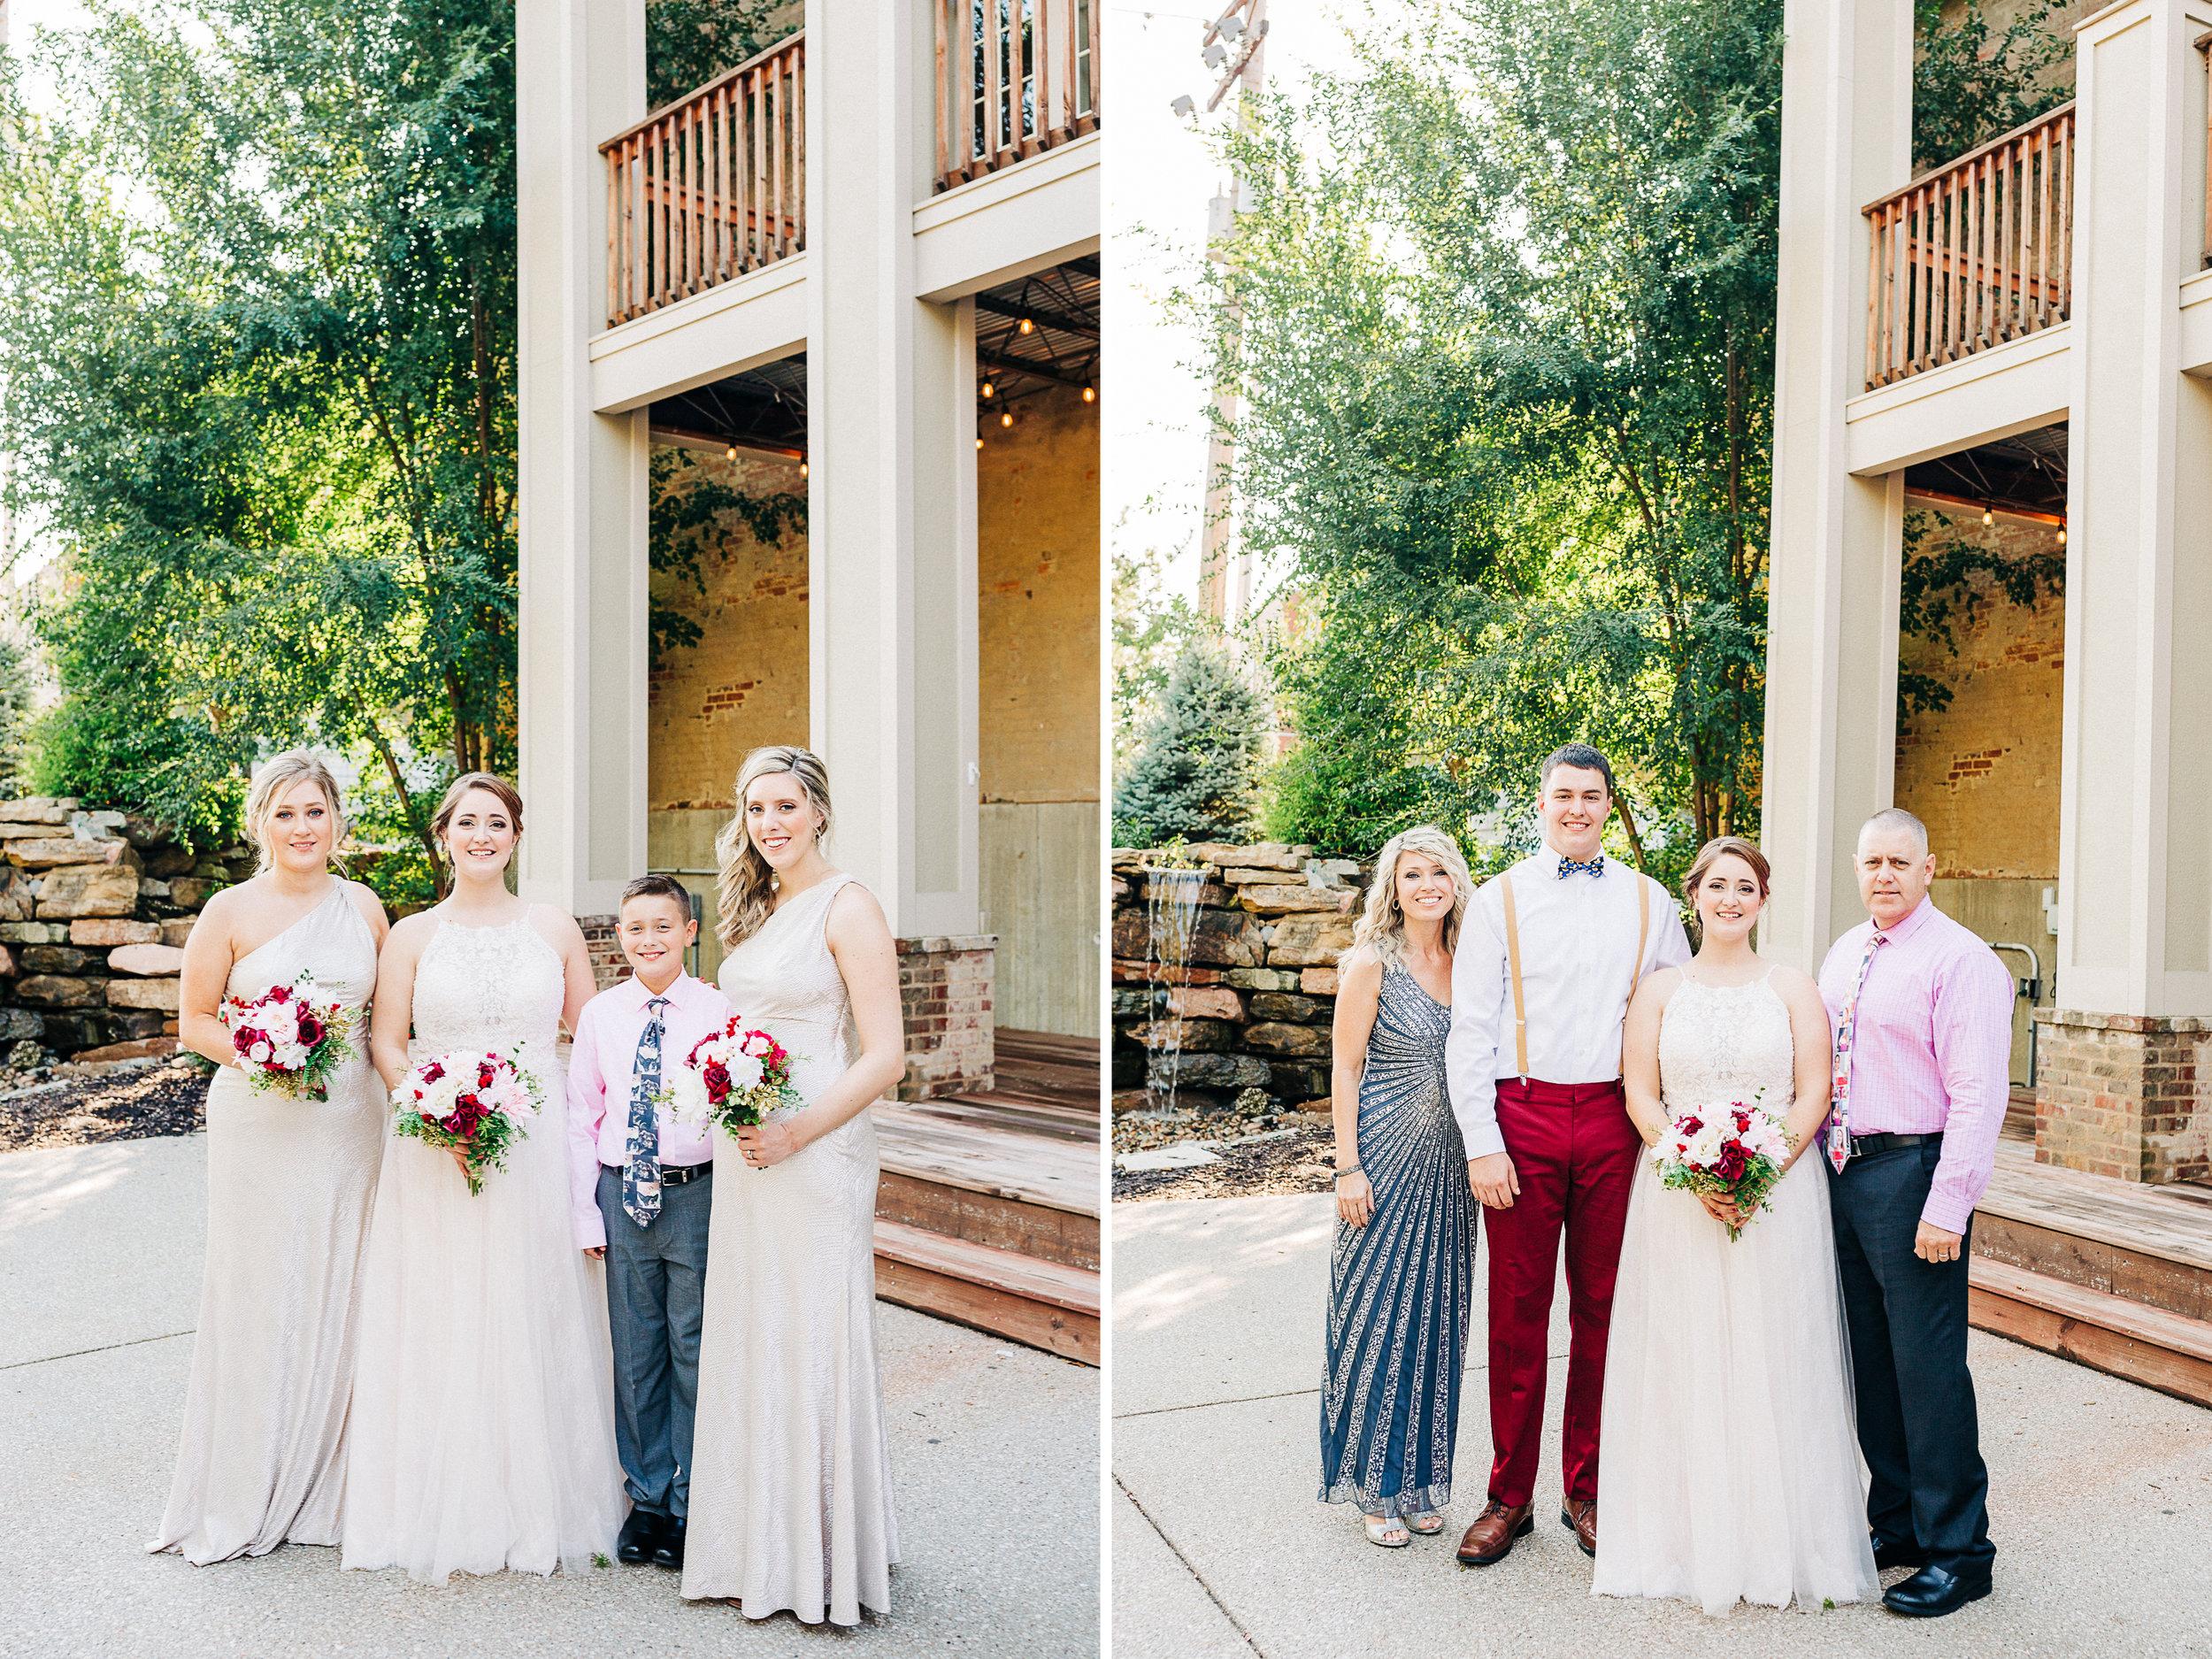 Dorothy_Louise_Photography_Eric_Fallon_La-Belle_Coeur_Main_Street_St_Charles_Wedding_Collage13.jpg